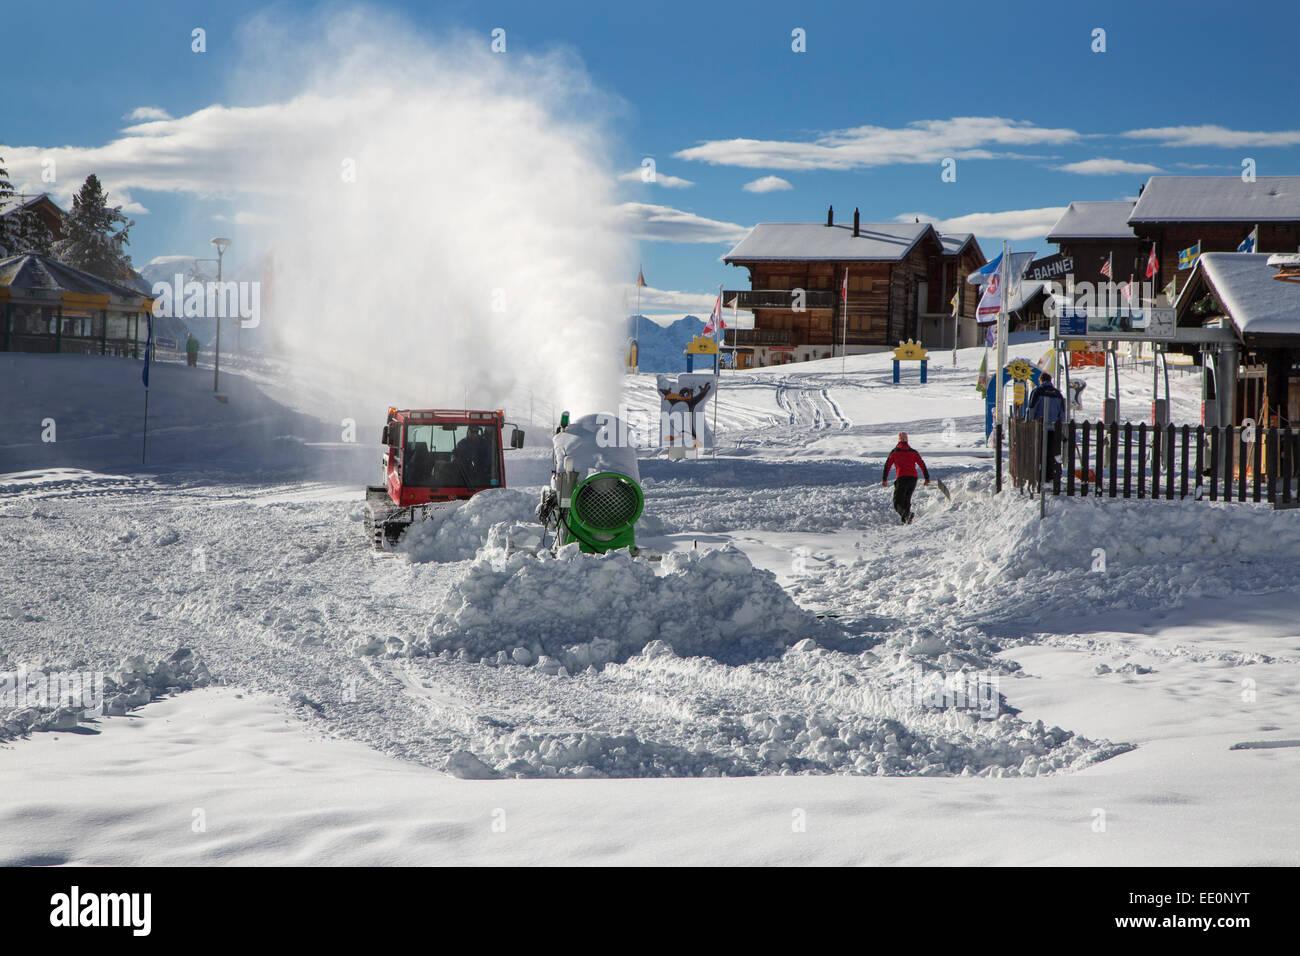 Snow cannon / snowgun and snow groomer vehicle preparing ski run in winter at Riederalp, Wallis / Valais, Switzerland - Stock Image